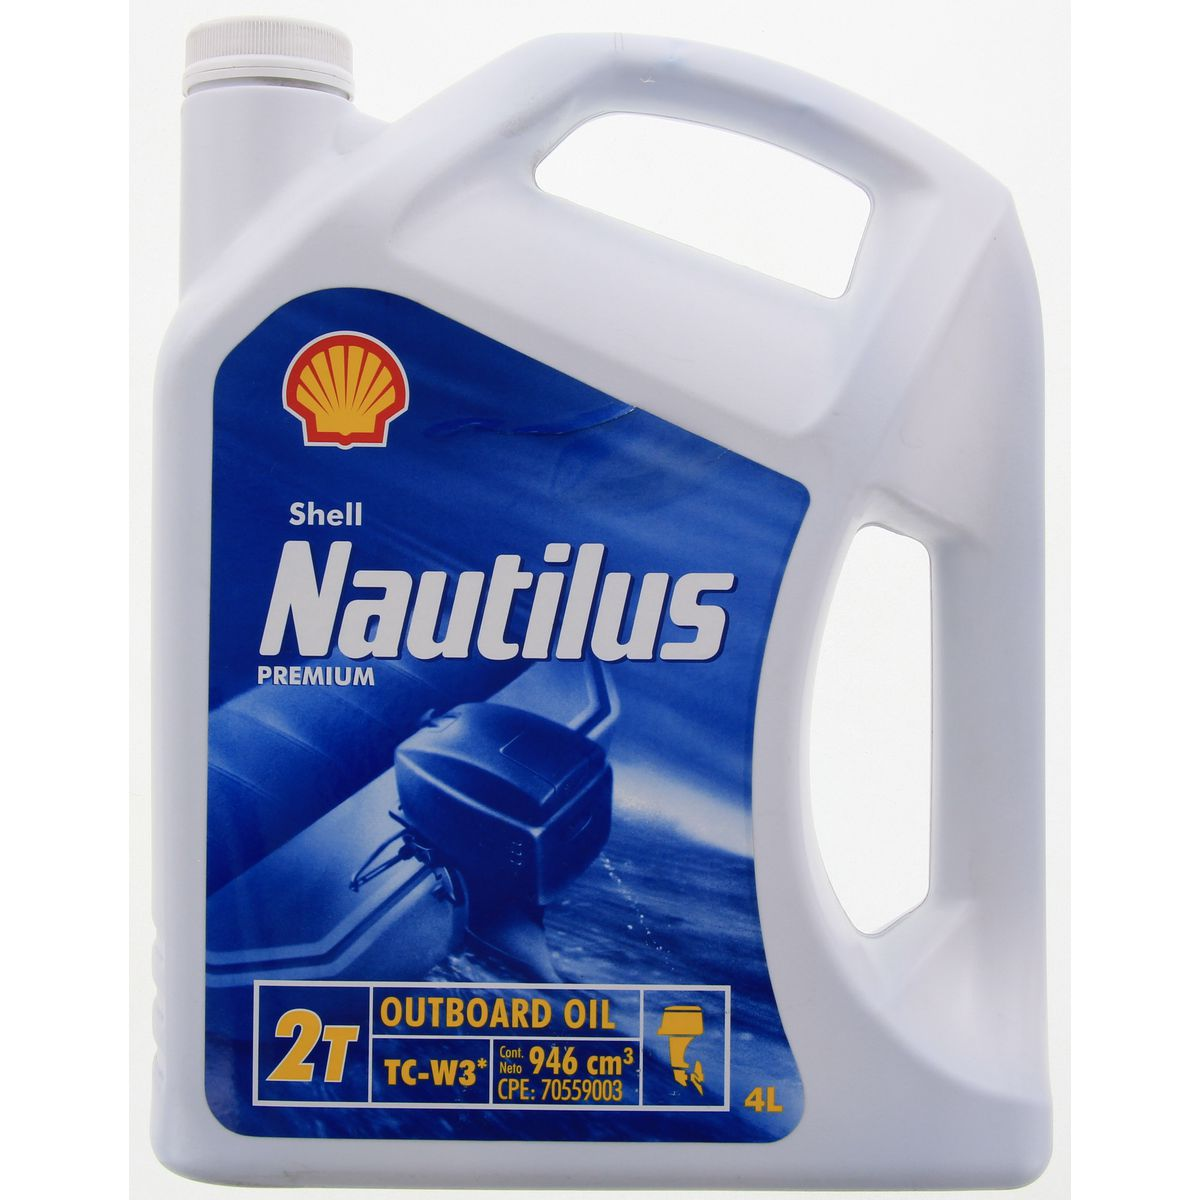 Shell Nautilus 2T Premium Outboard Oil TC-W3 (946mL, 5L)